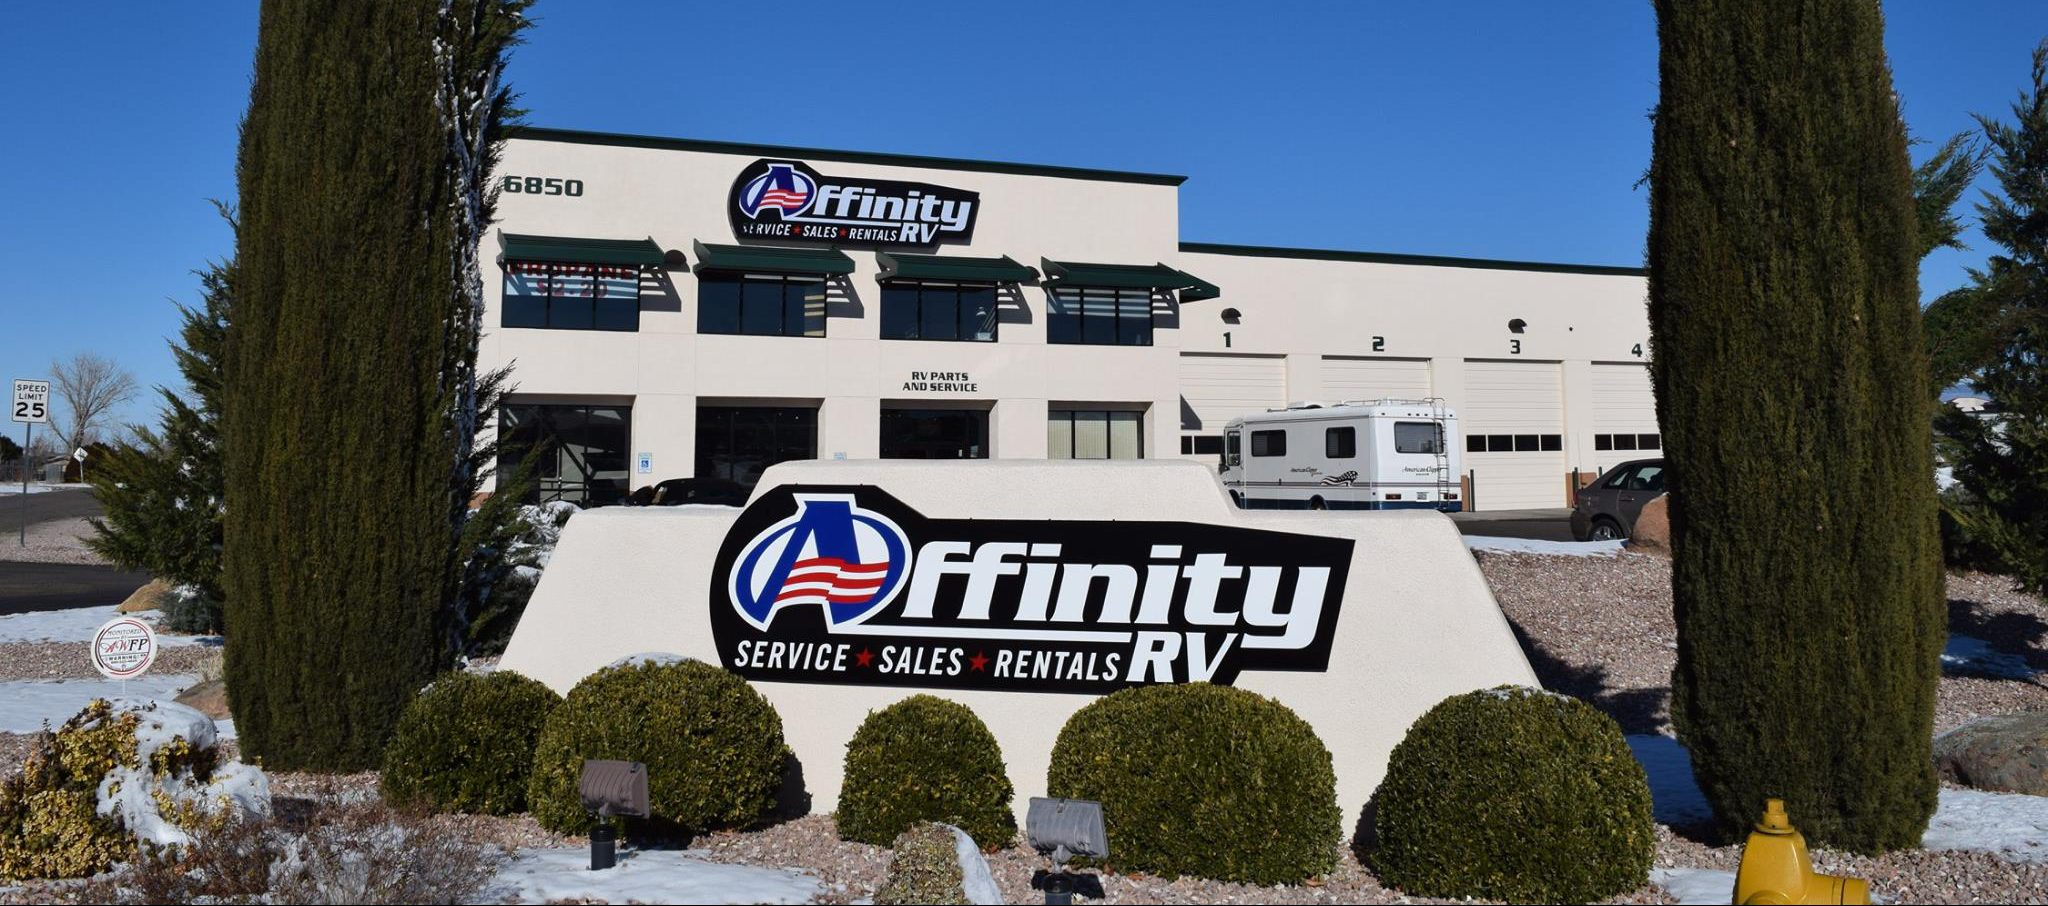 Featured RV Dealer: Affinity RV